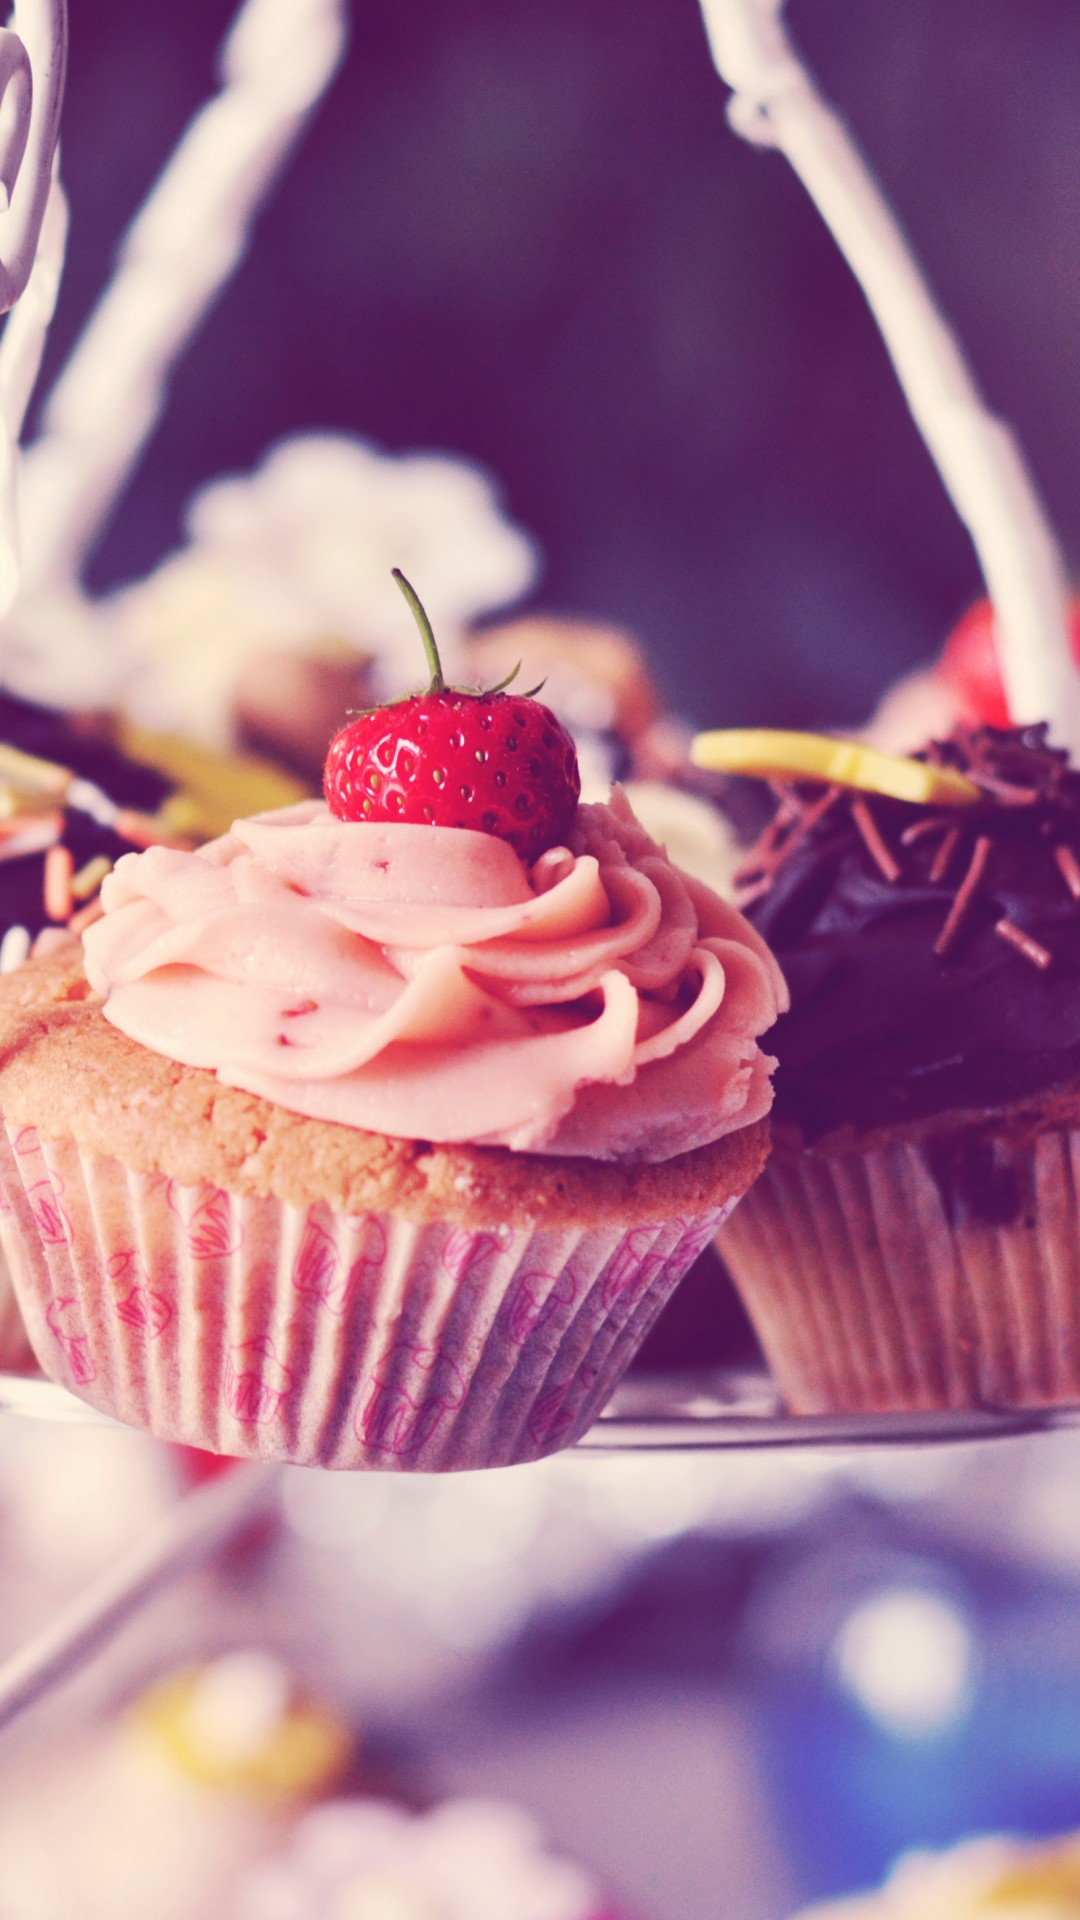 Обои кексы, клубника, сахарная пудра, выпечка. Еда foto 11